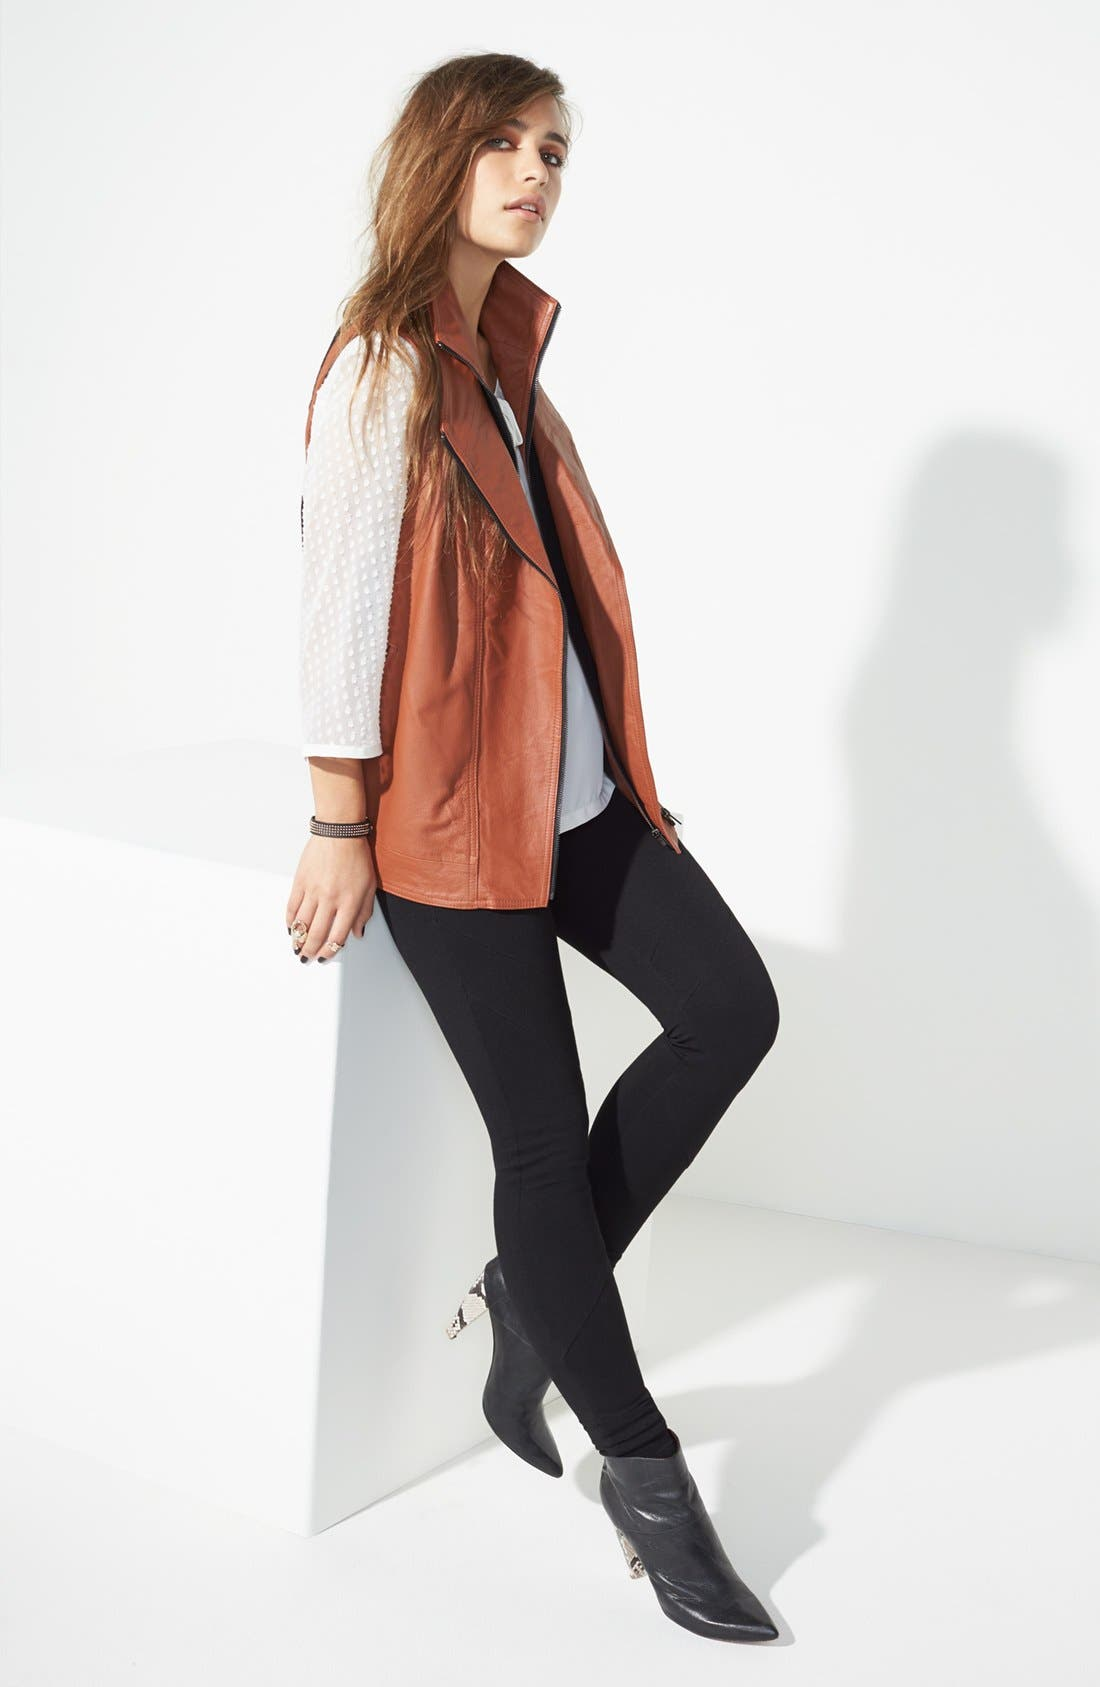 Main Image - Mural Leather Vest, Tildon Mixed Blouse & edyson Ponte Knit Skinny Pants